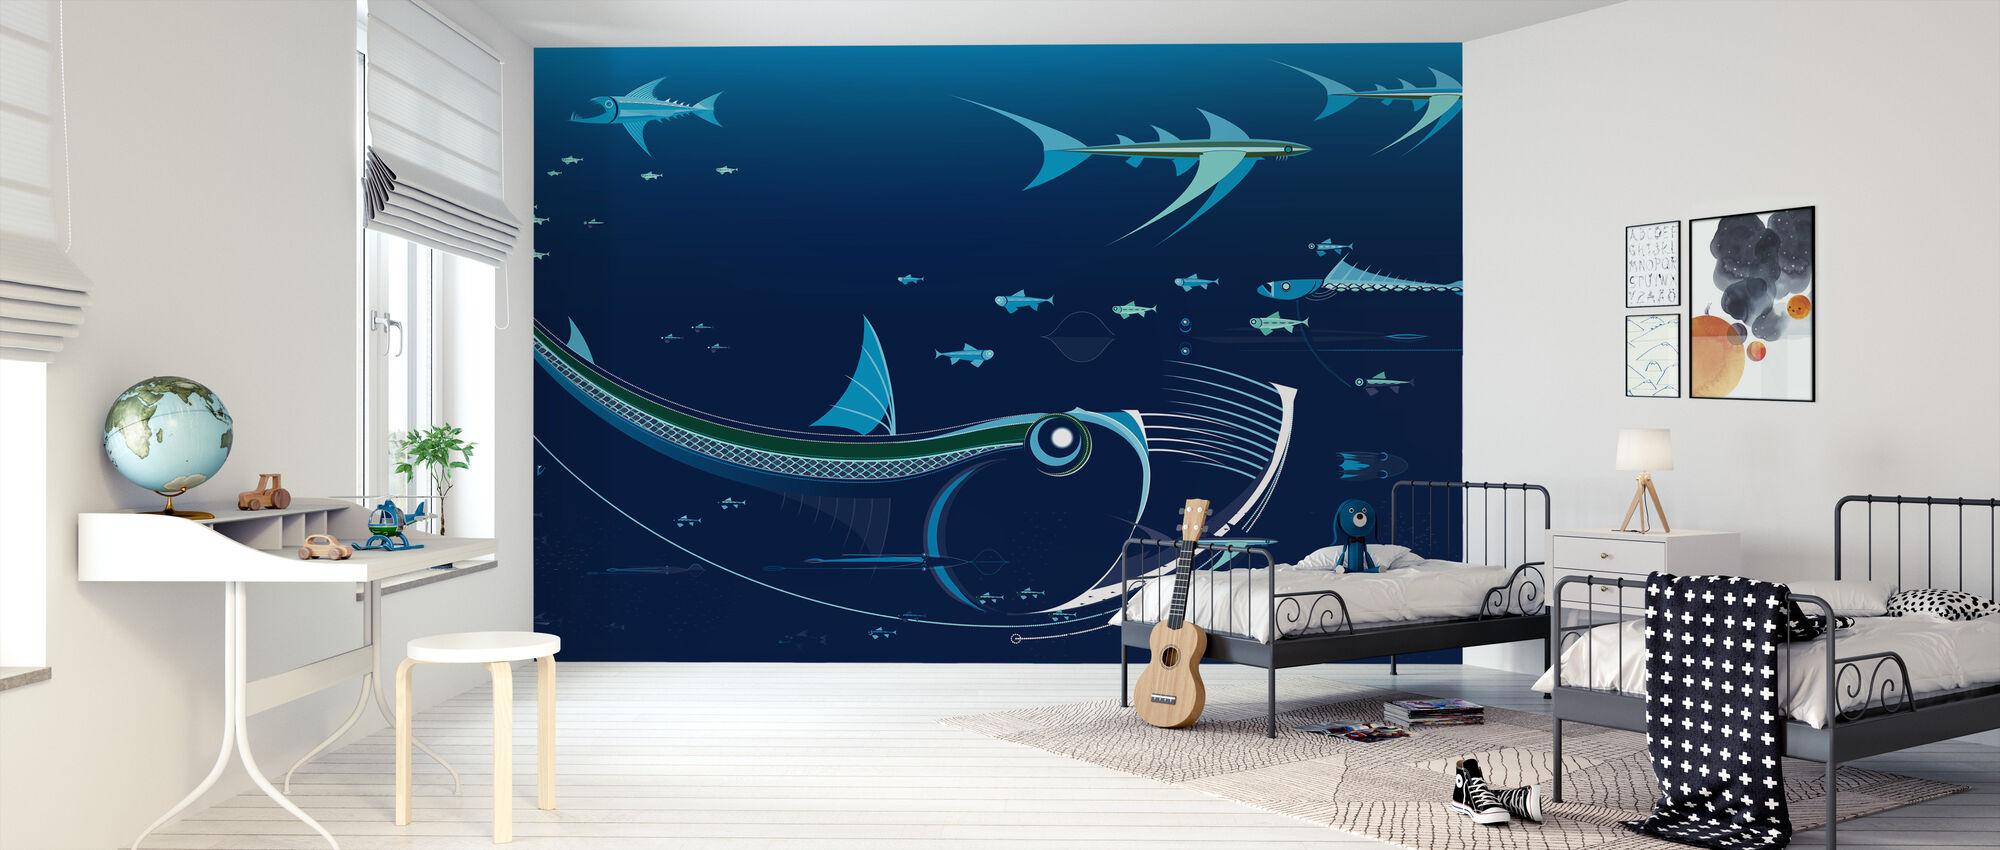 Northmix Blue - Wallpaper - Kids Room